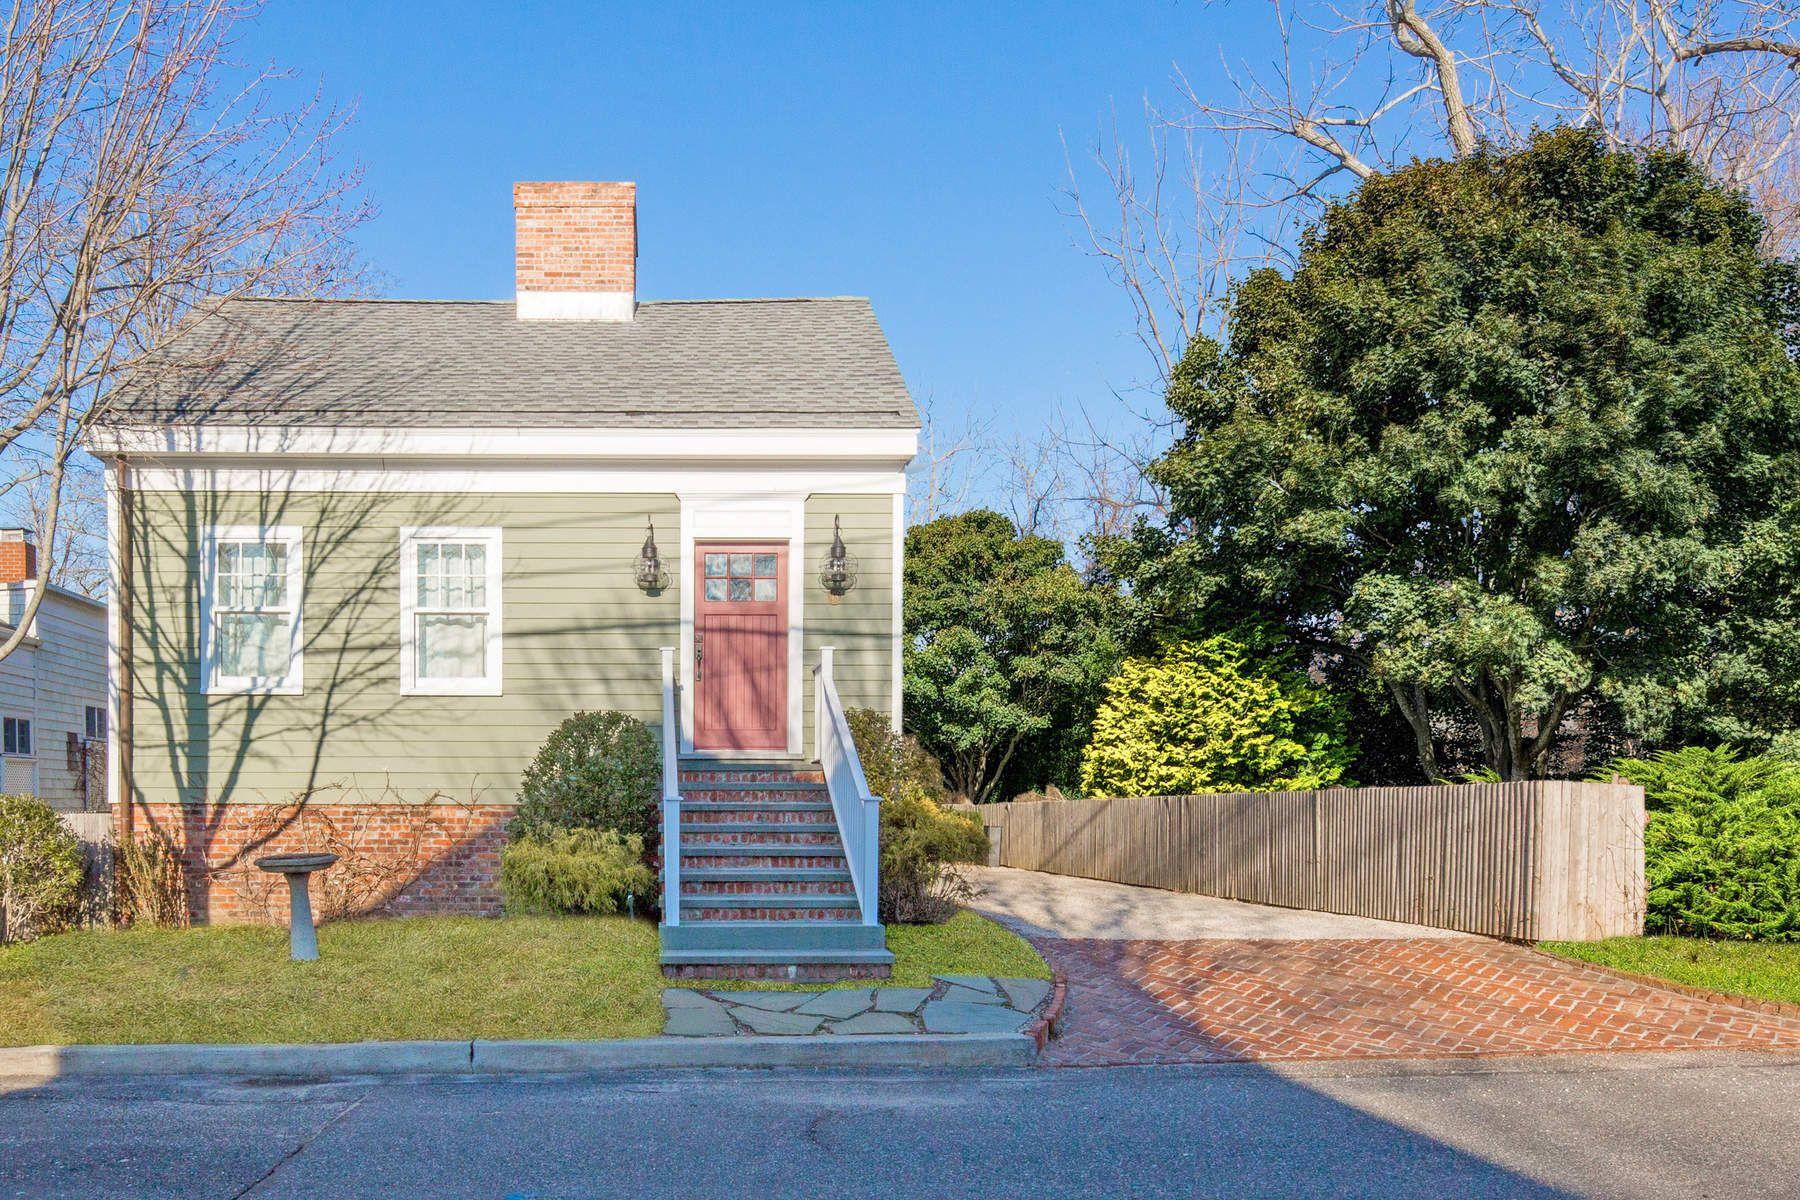 独户住宅 为 销售 在 Village Home Overlooking Reserve 48 Garden Street, Sag Harbor Village, 萨格港, 纽约州, 11963 美国